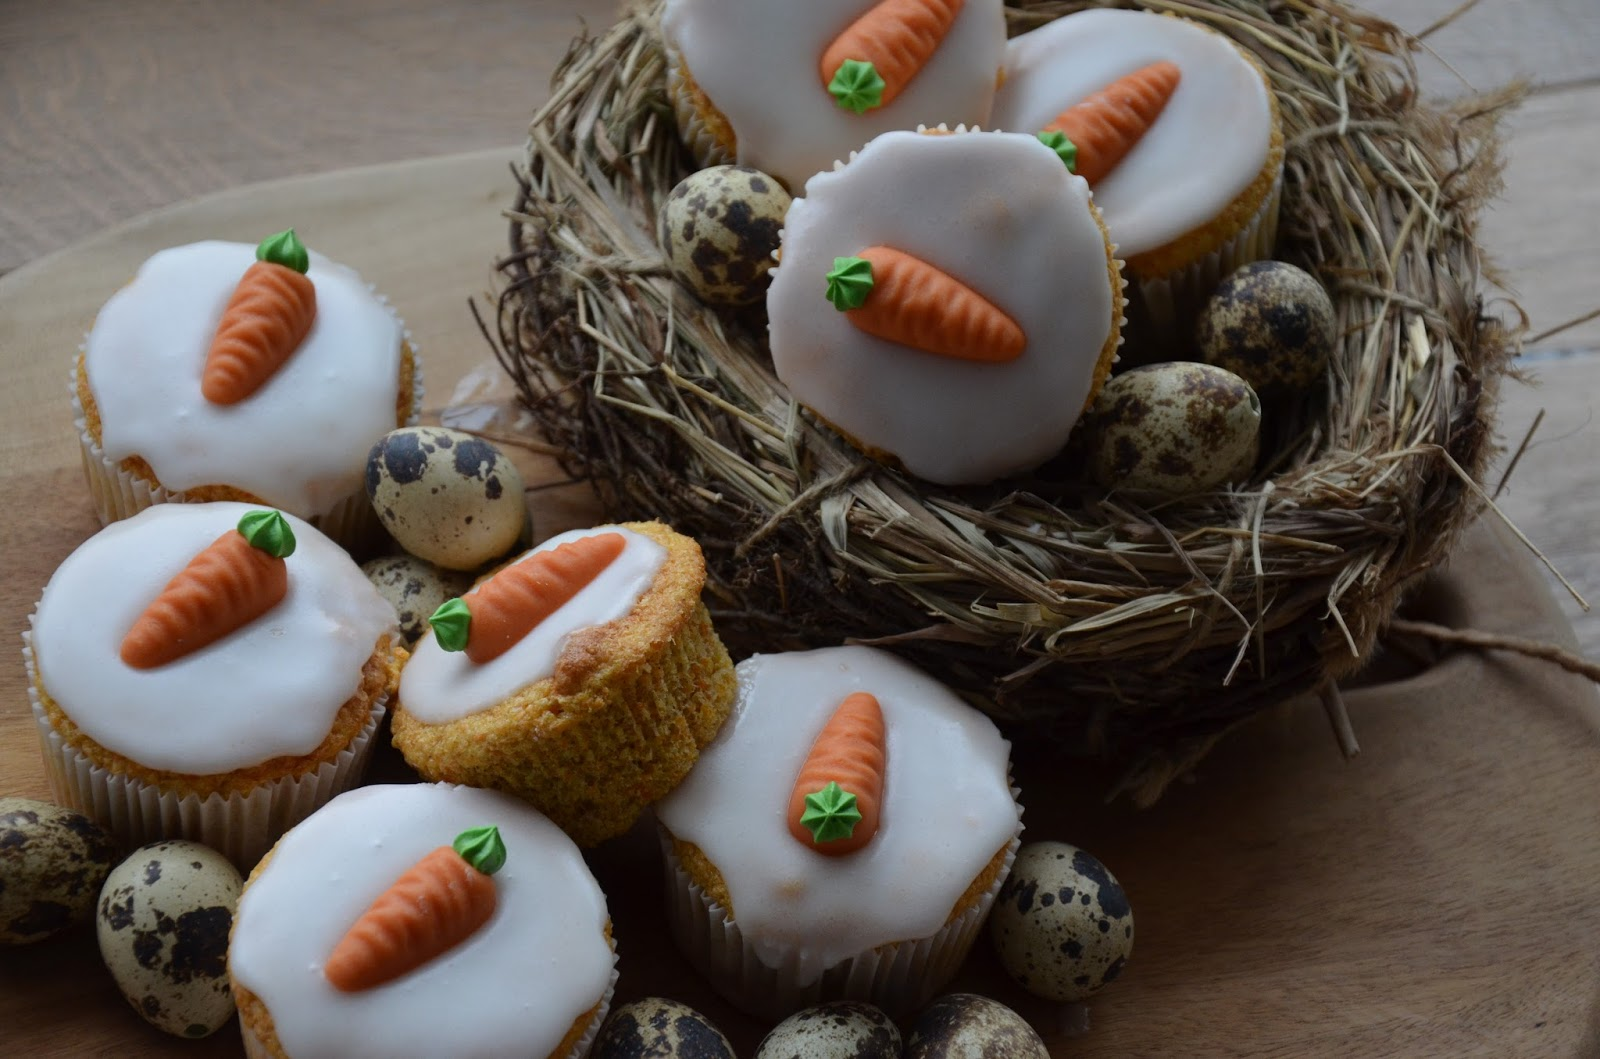 Möhren-Muffins ohne Fett - Rezeptra - Food and More